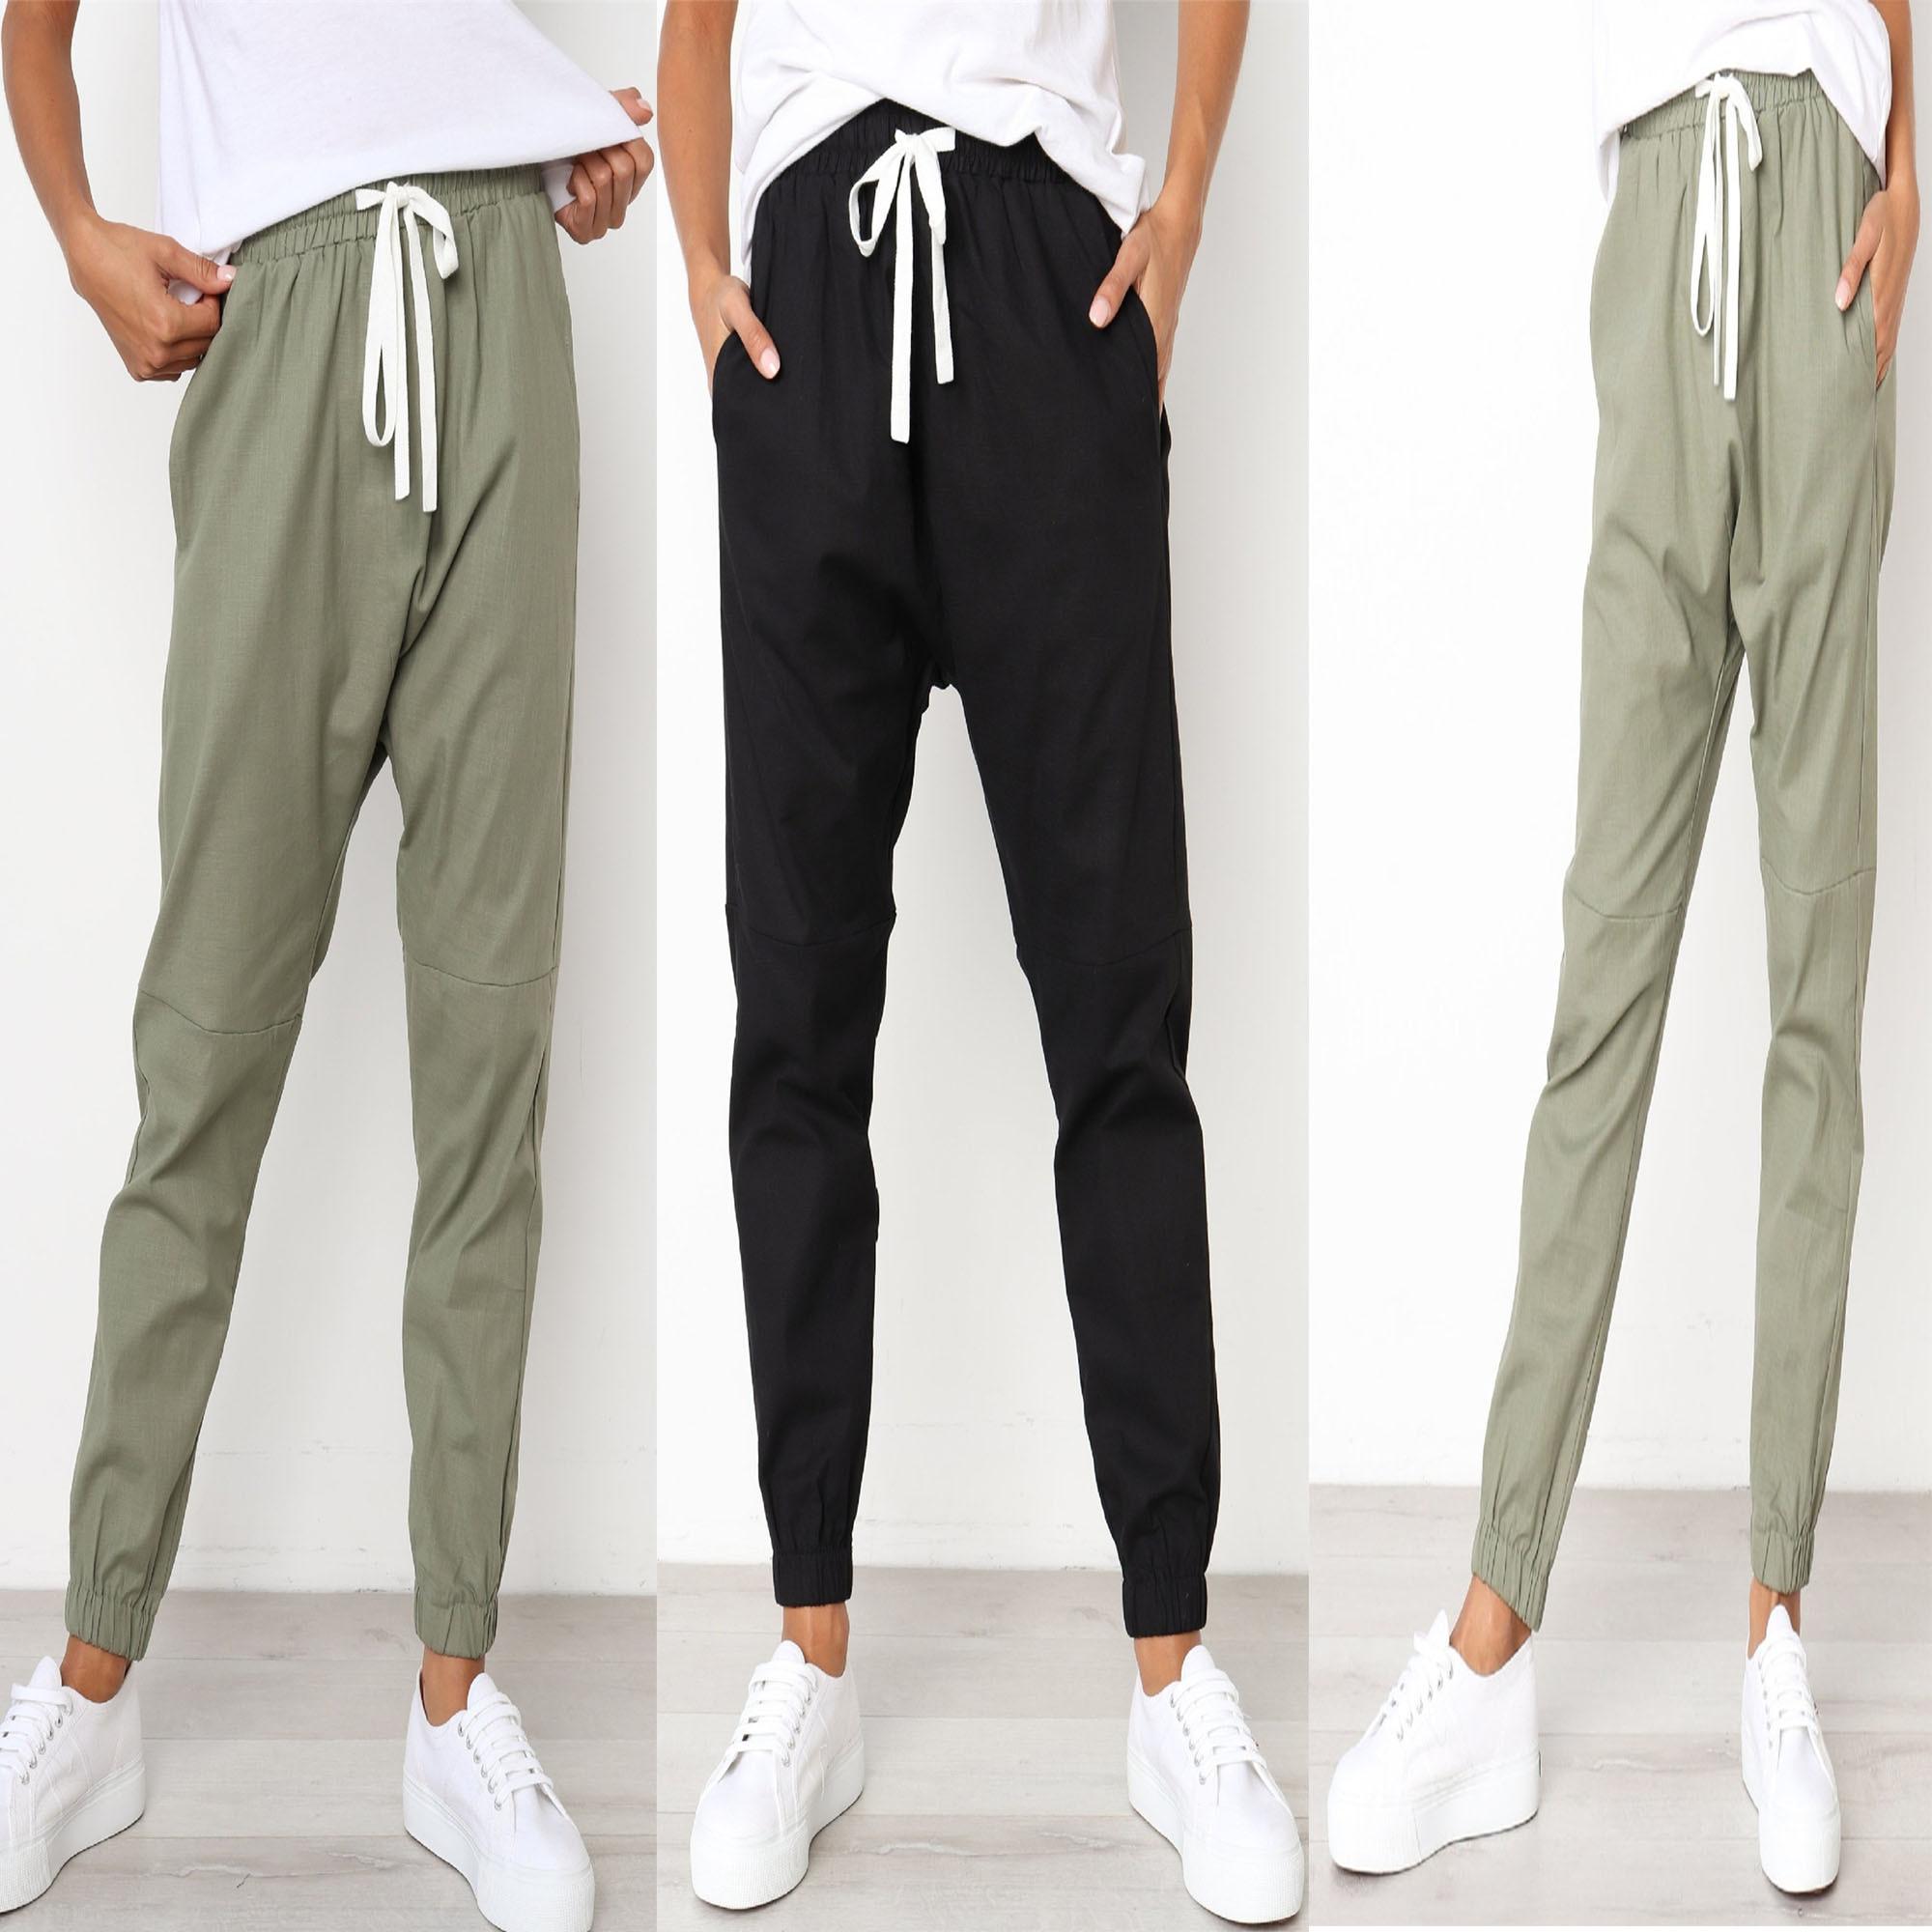 Summer New Women Cargo   Pants   Elastic Waist Solid Trousers Ankle Length   Pants   Joggers Streetwear Sweat   Pants     Capris   Female PT017